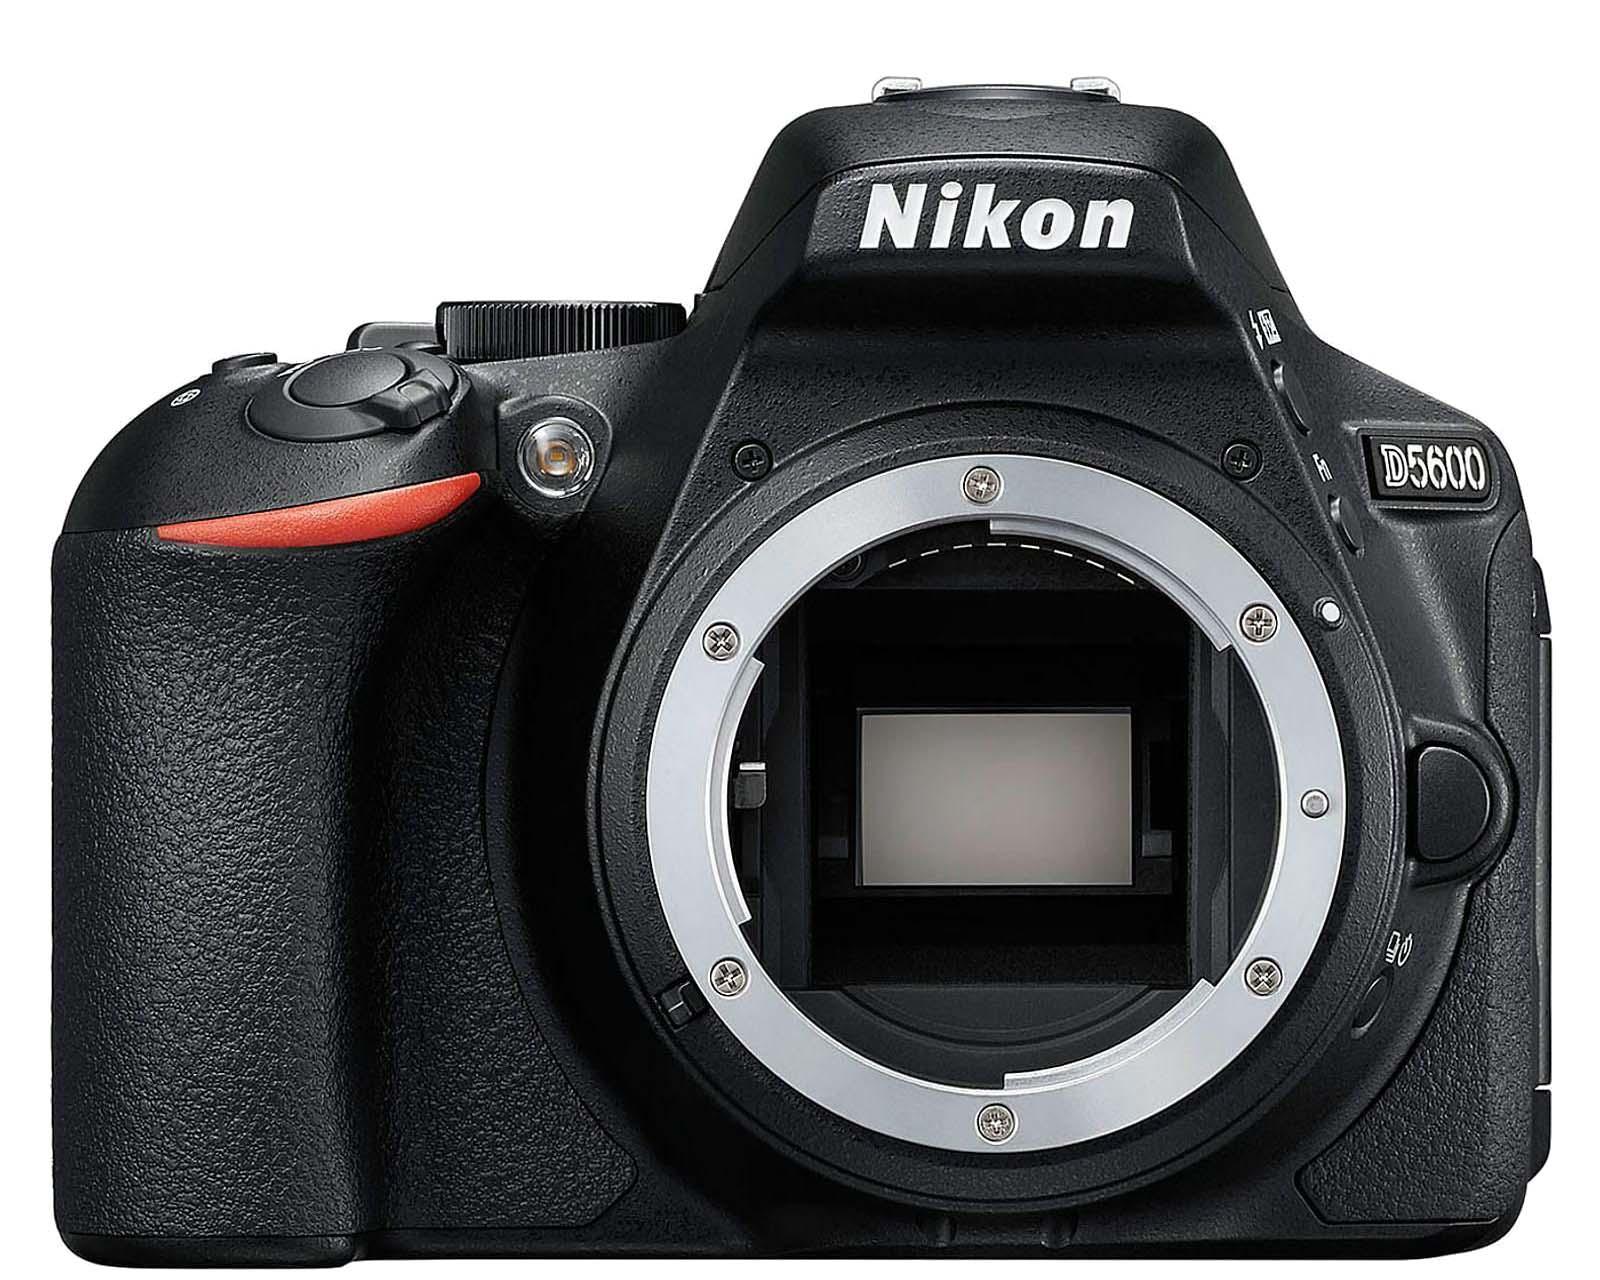 Nikon D5600 - base de datos